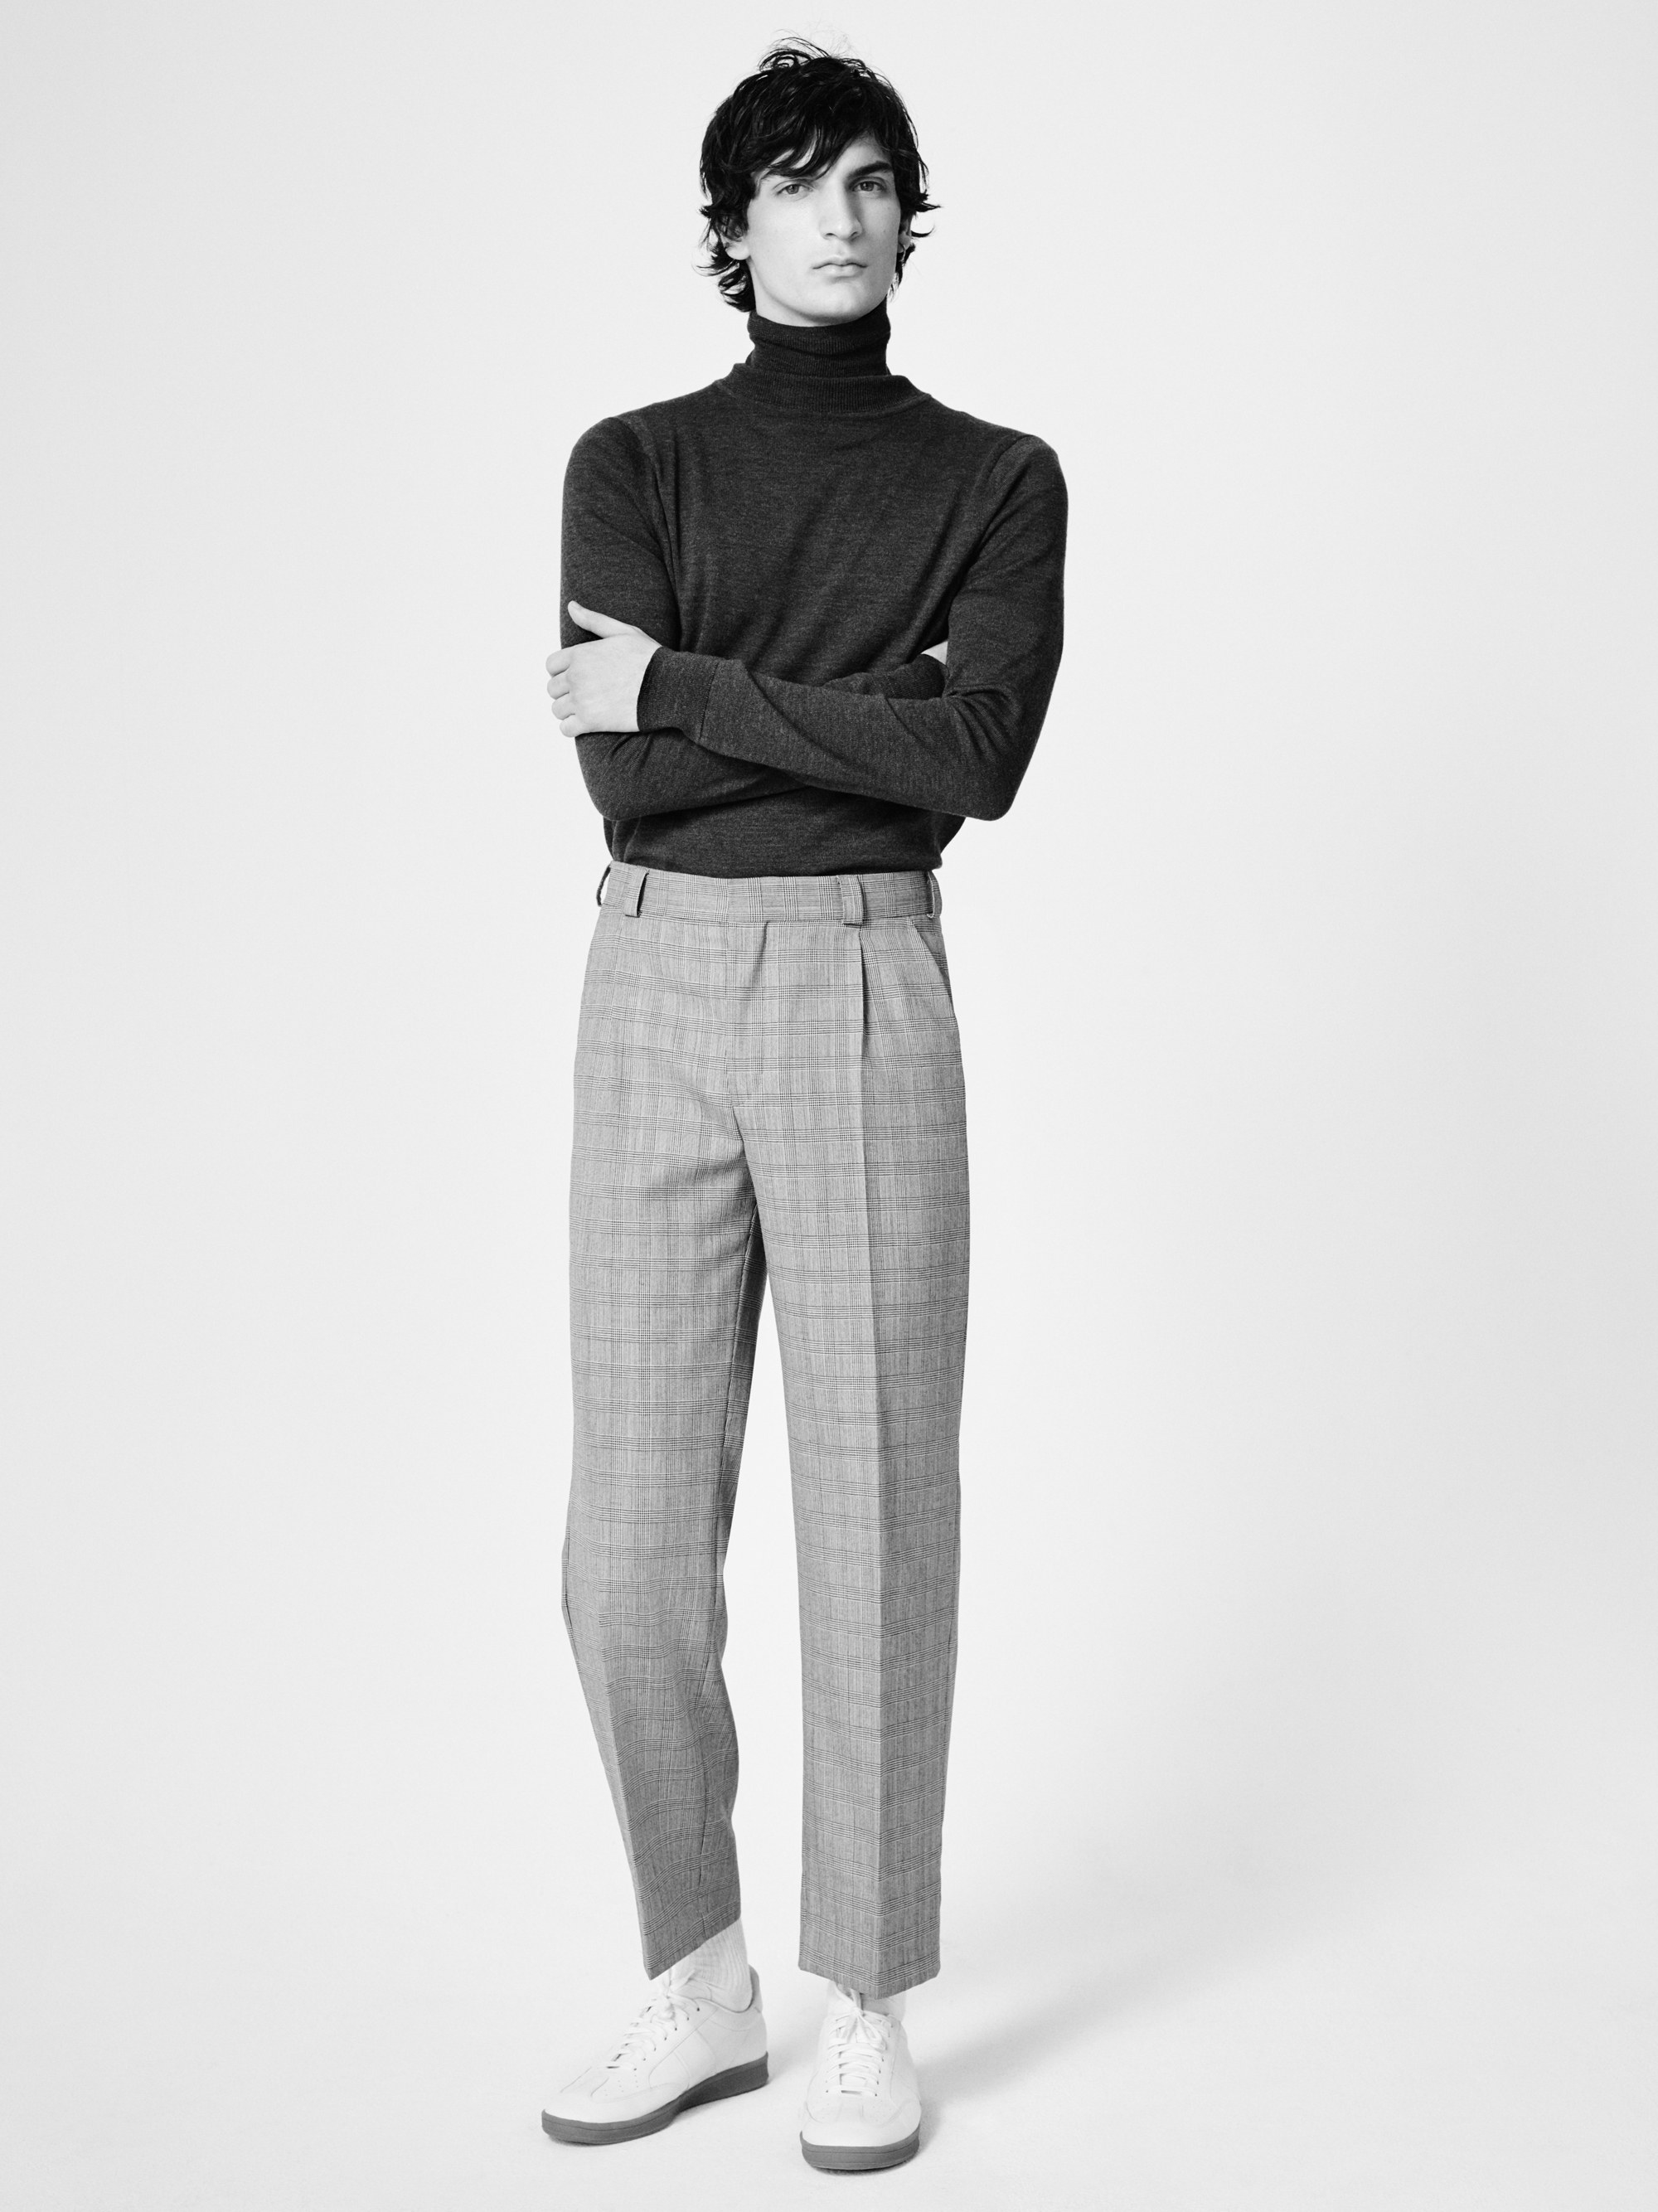 ELLE Man Style Calendar trẻ trung với vải dệt kim (11 – 712018) elleman 1